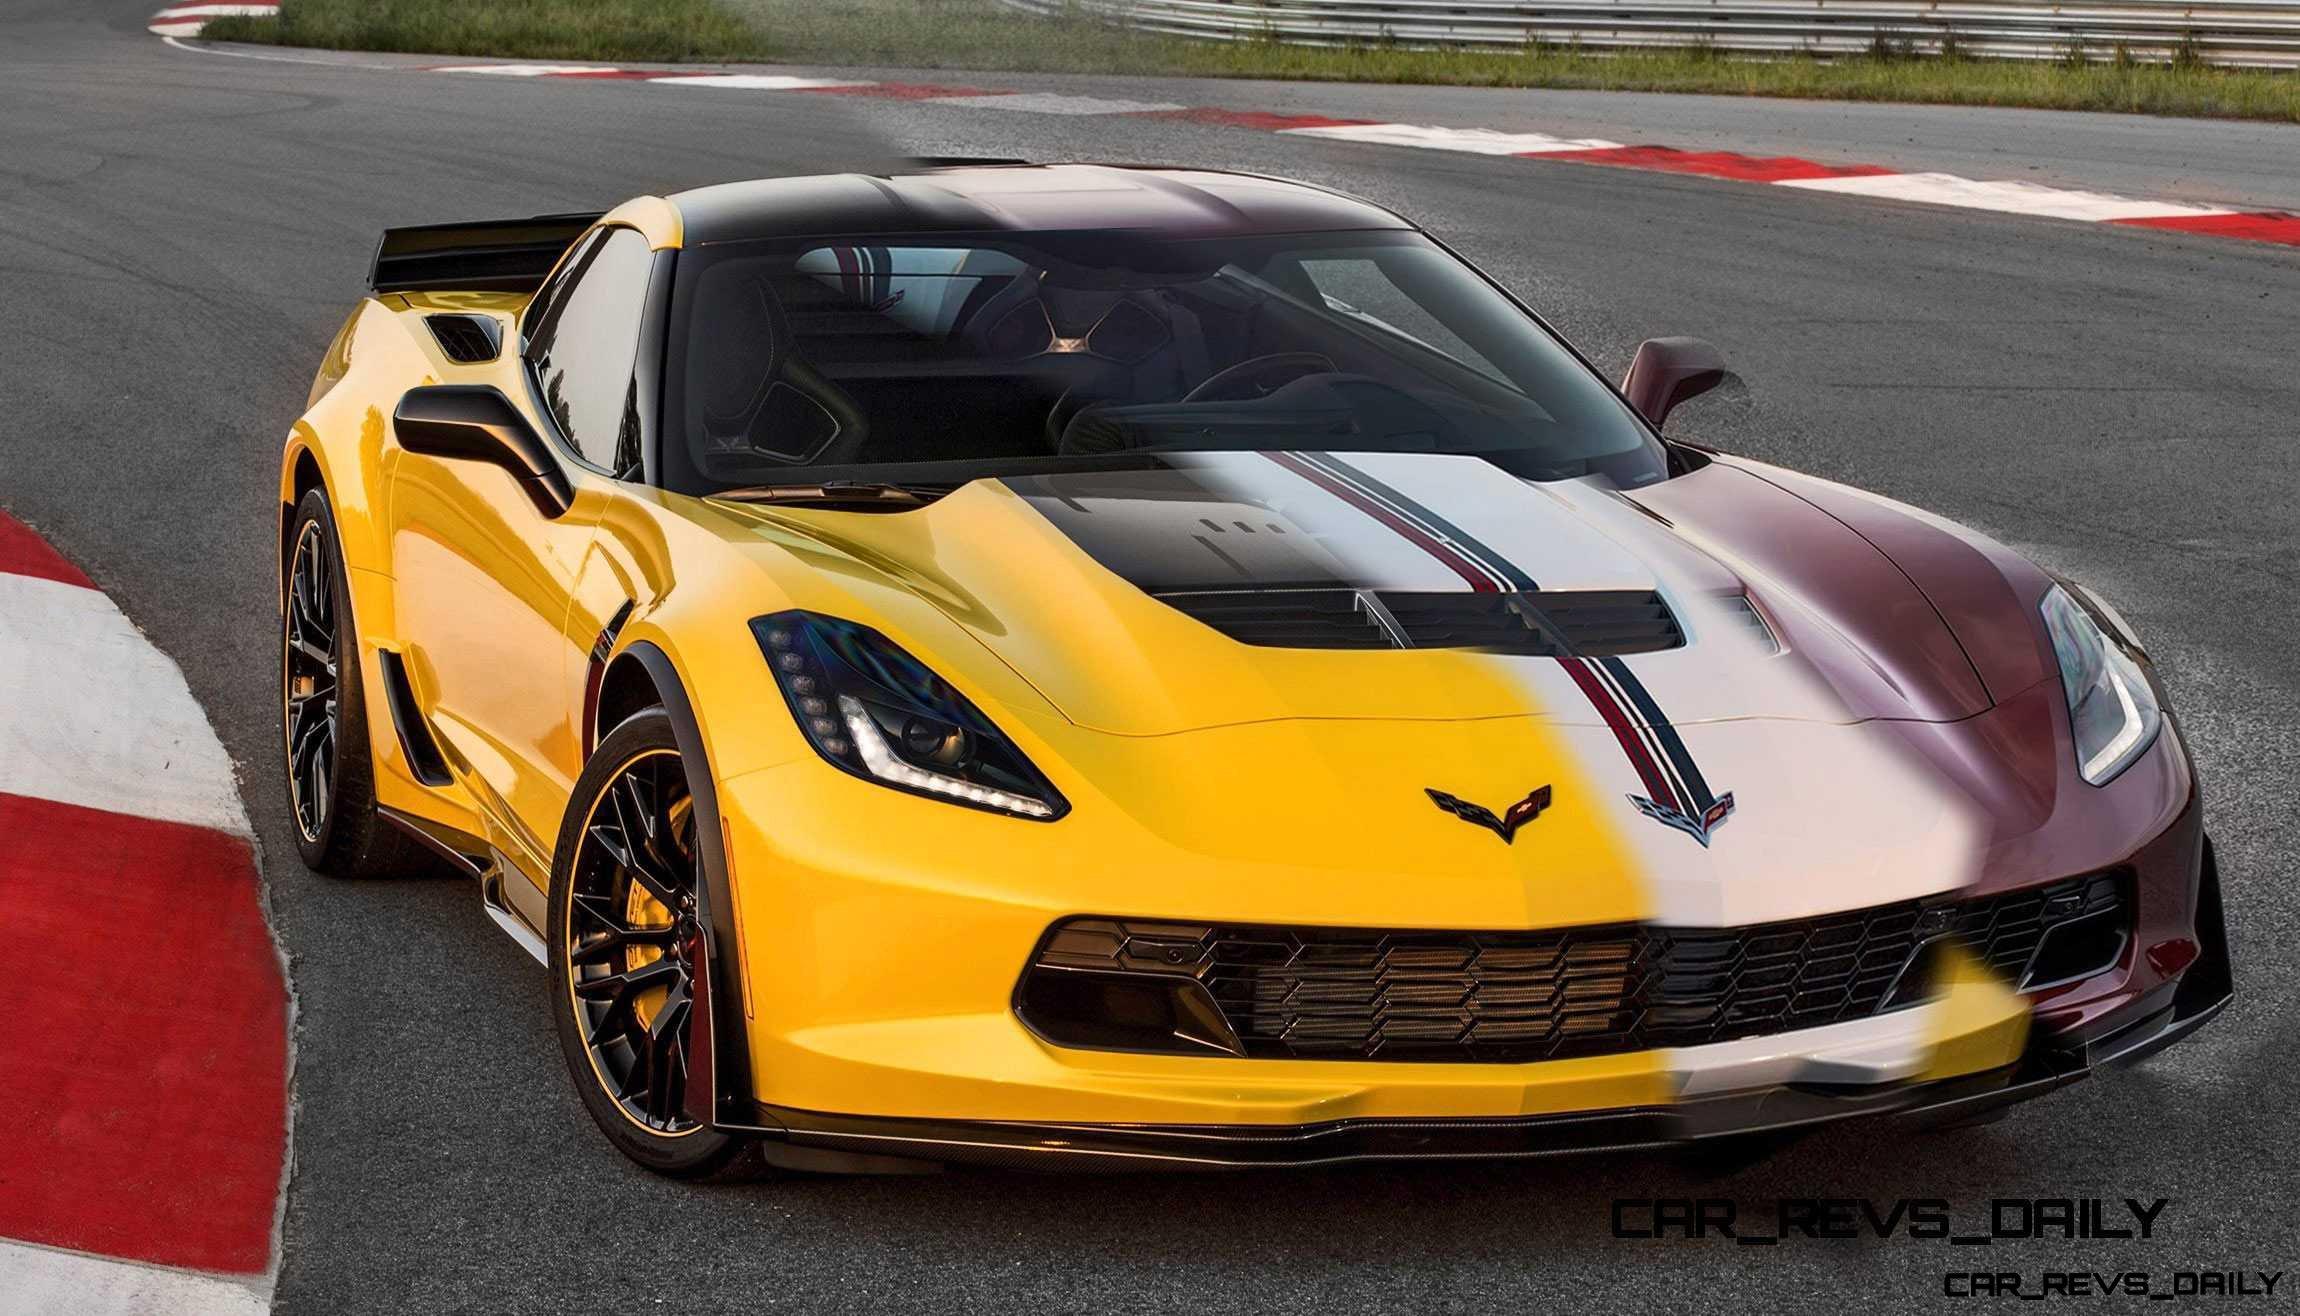 2016-Chevrolet-Corvette-Z06-C7_4s